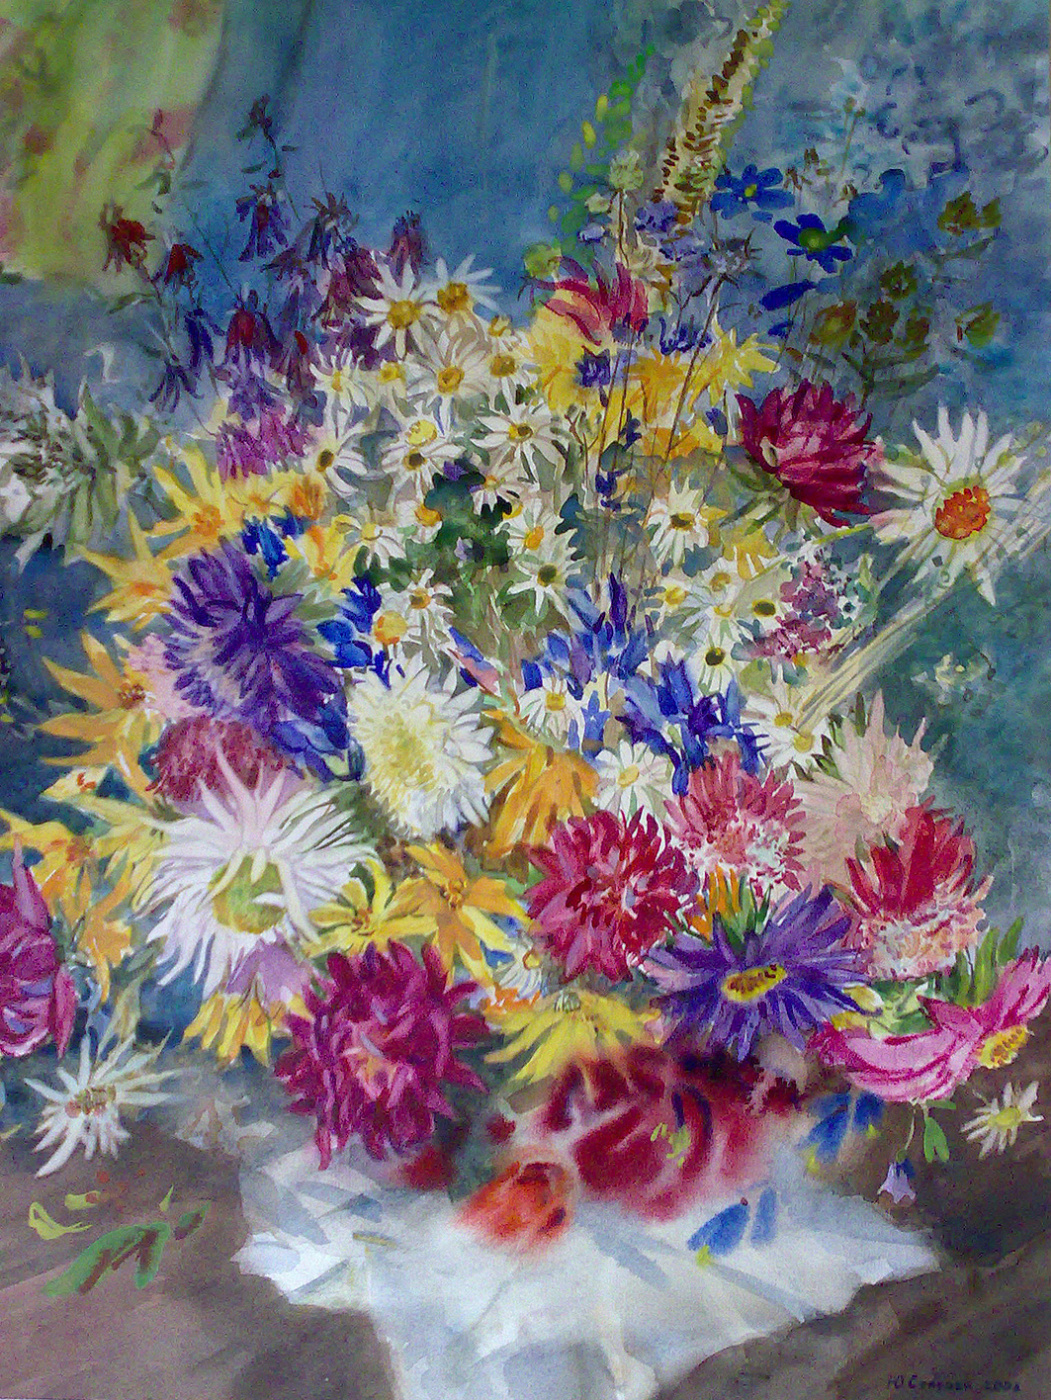 YULIANNA VLADIMIROVNA STAROVA. Bouquet